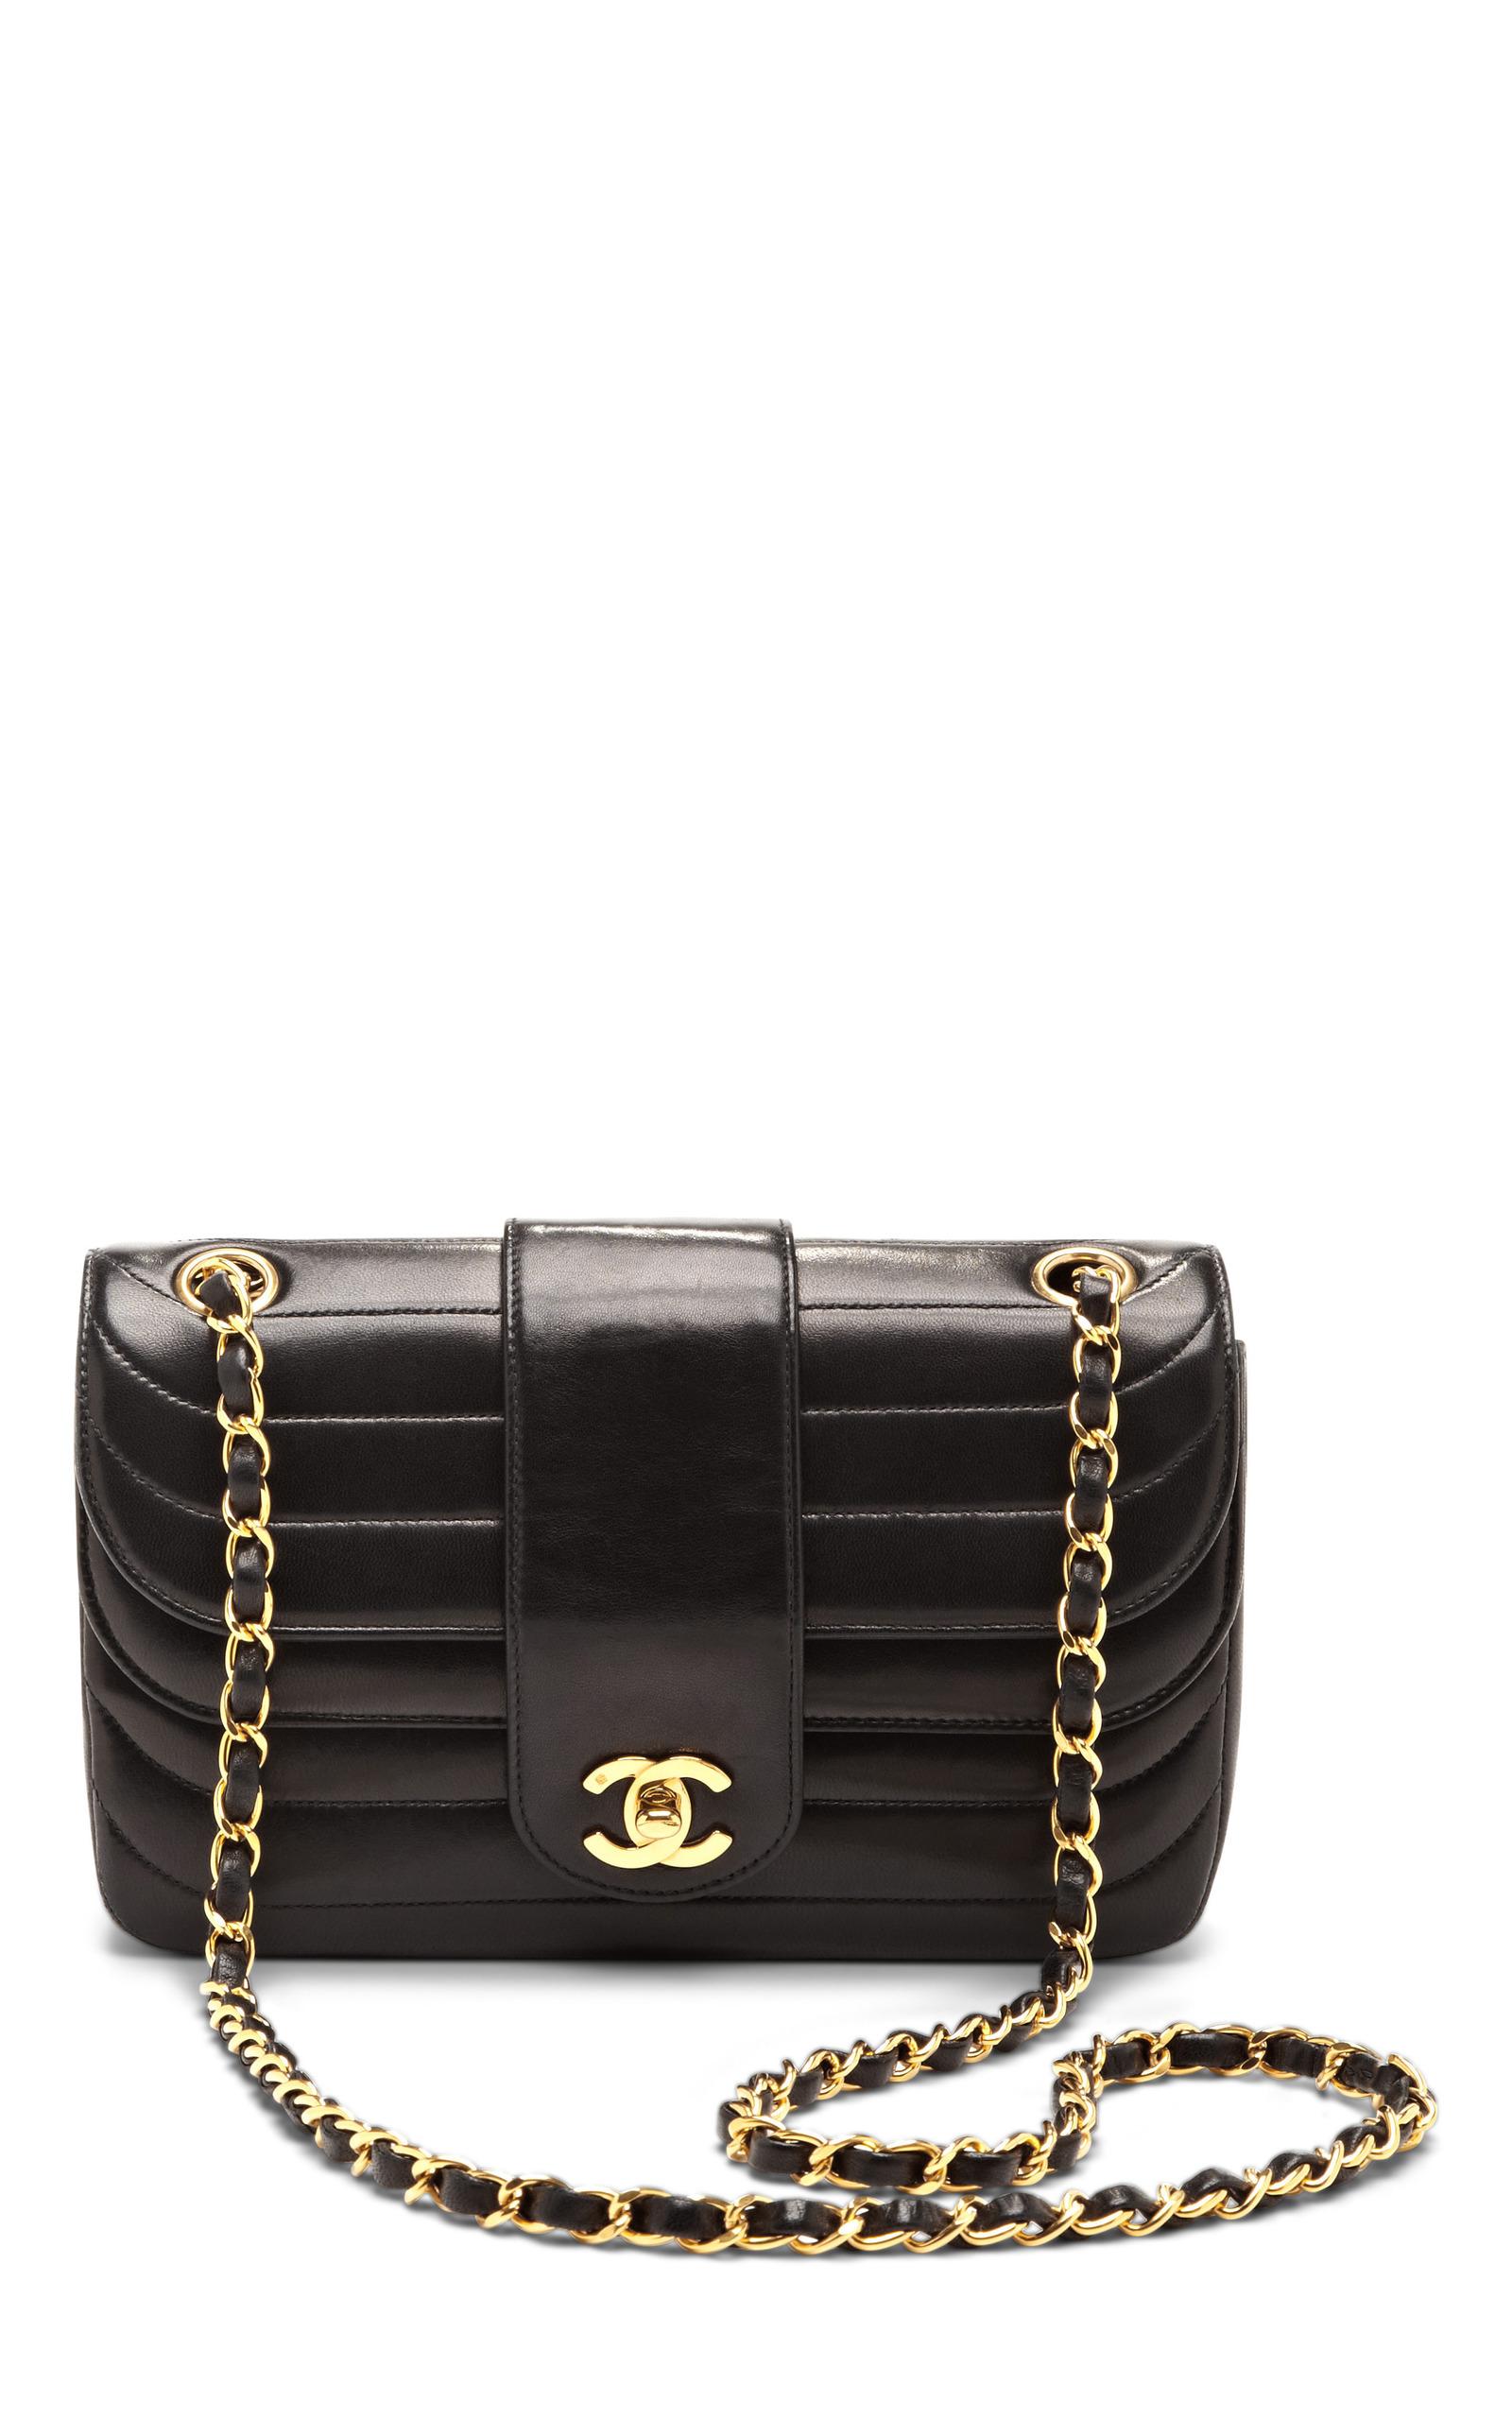 e91bf8e74c99 Collectible JacketsVintage Chanel Black Horizontal Stitch Double Flap  Lambskin Bag. CLOSE. Loading